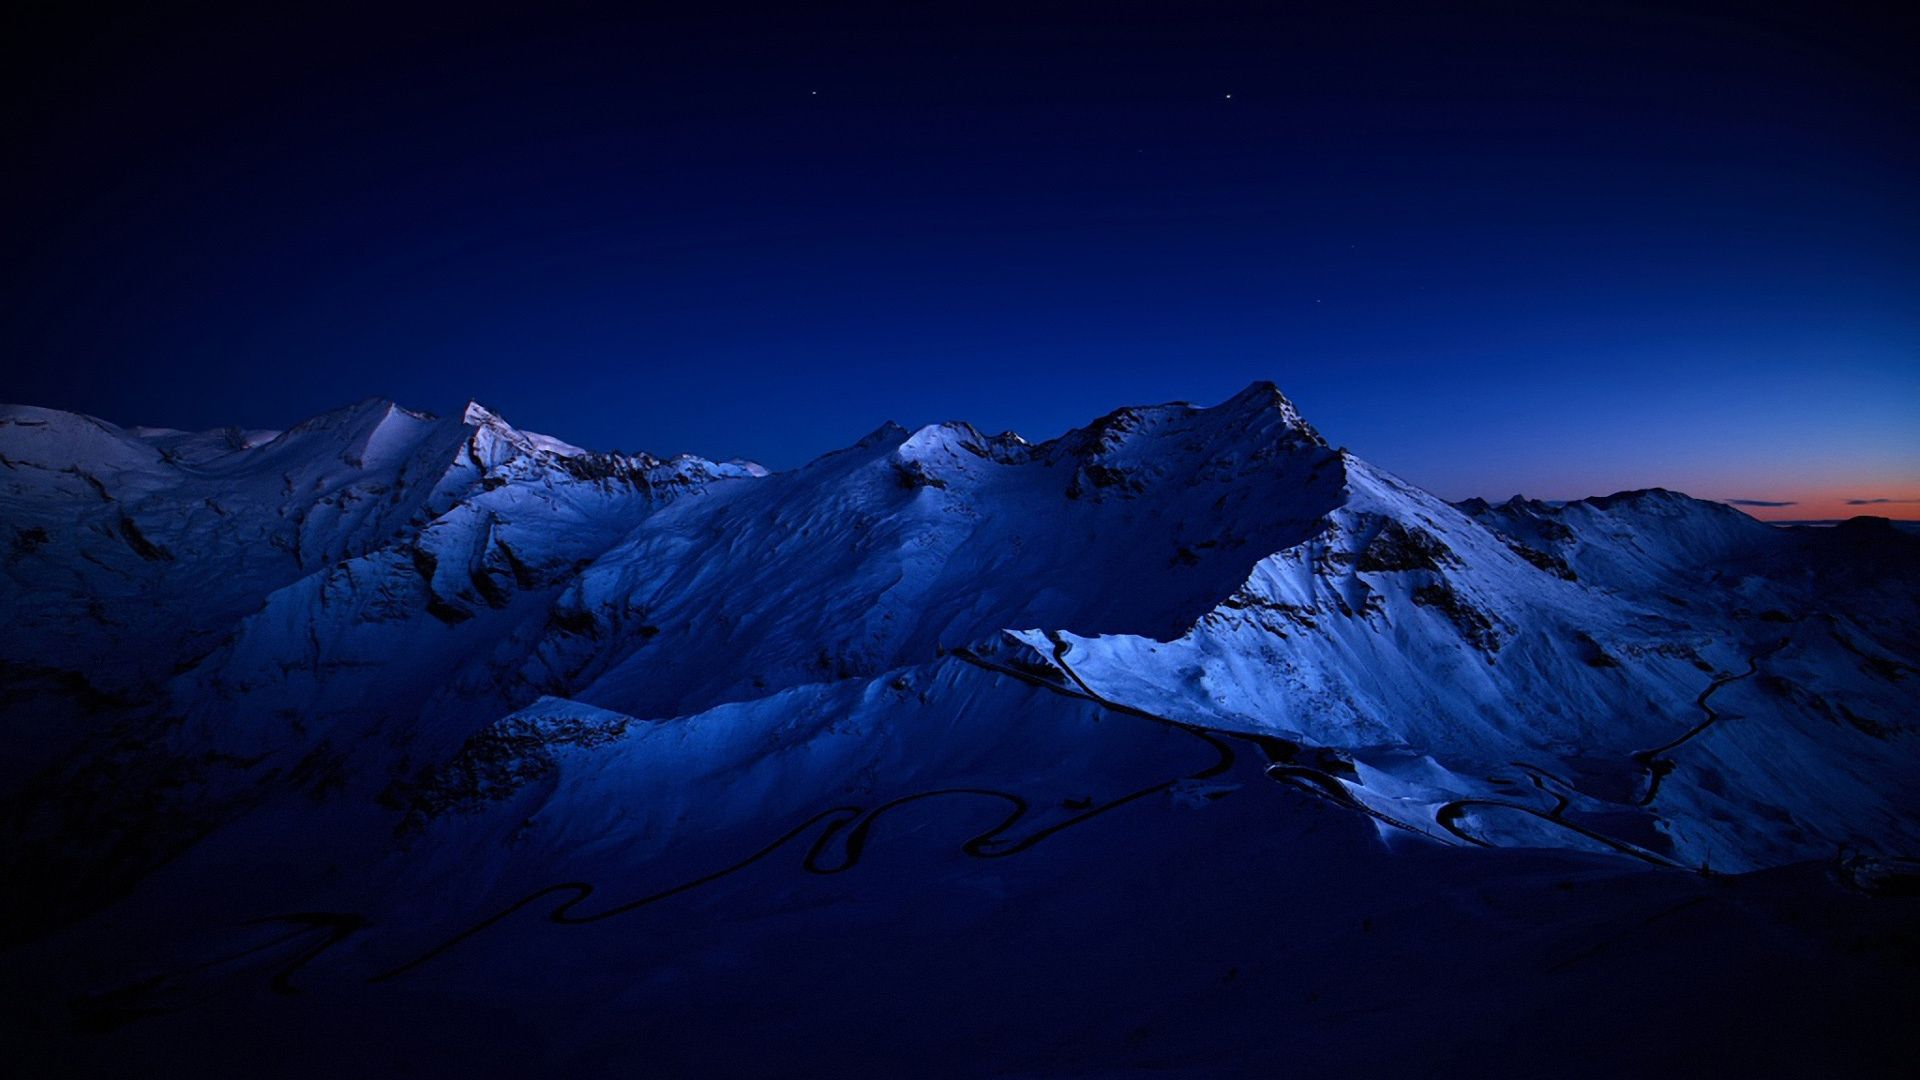 1080p mountain wallpaper